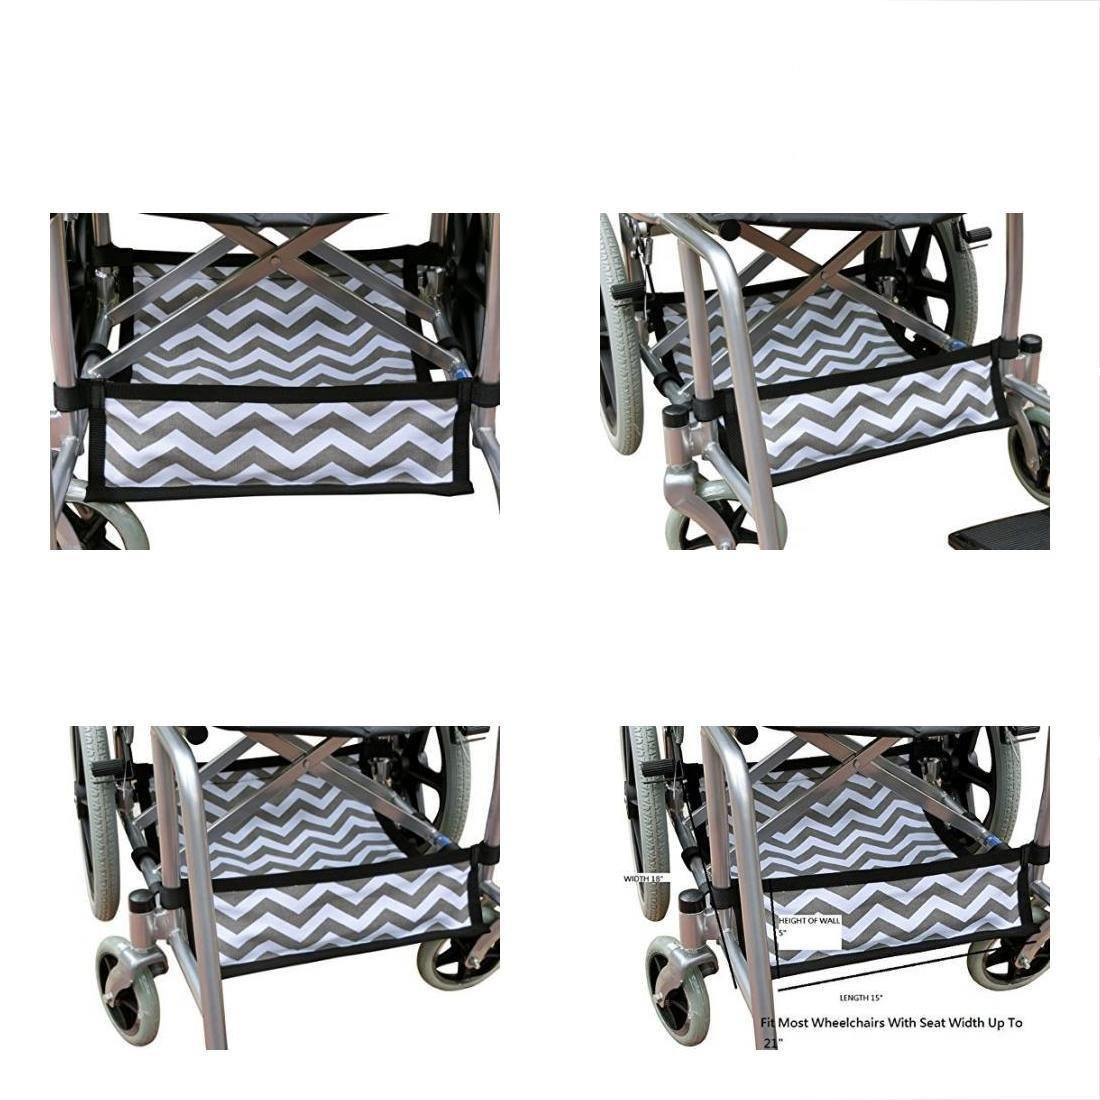 scooter Foldable Wheelchair Under Seat Storage Bag, Underneath Carrier, Basket, Chevron